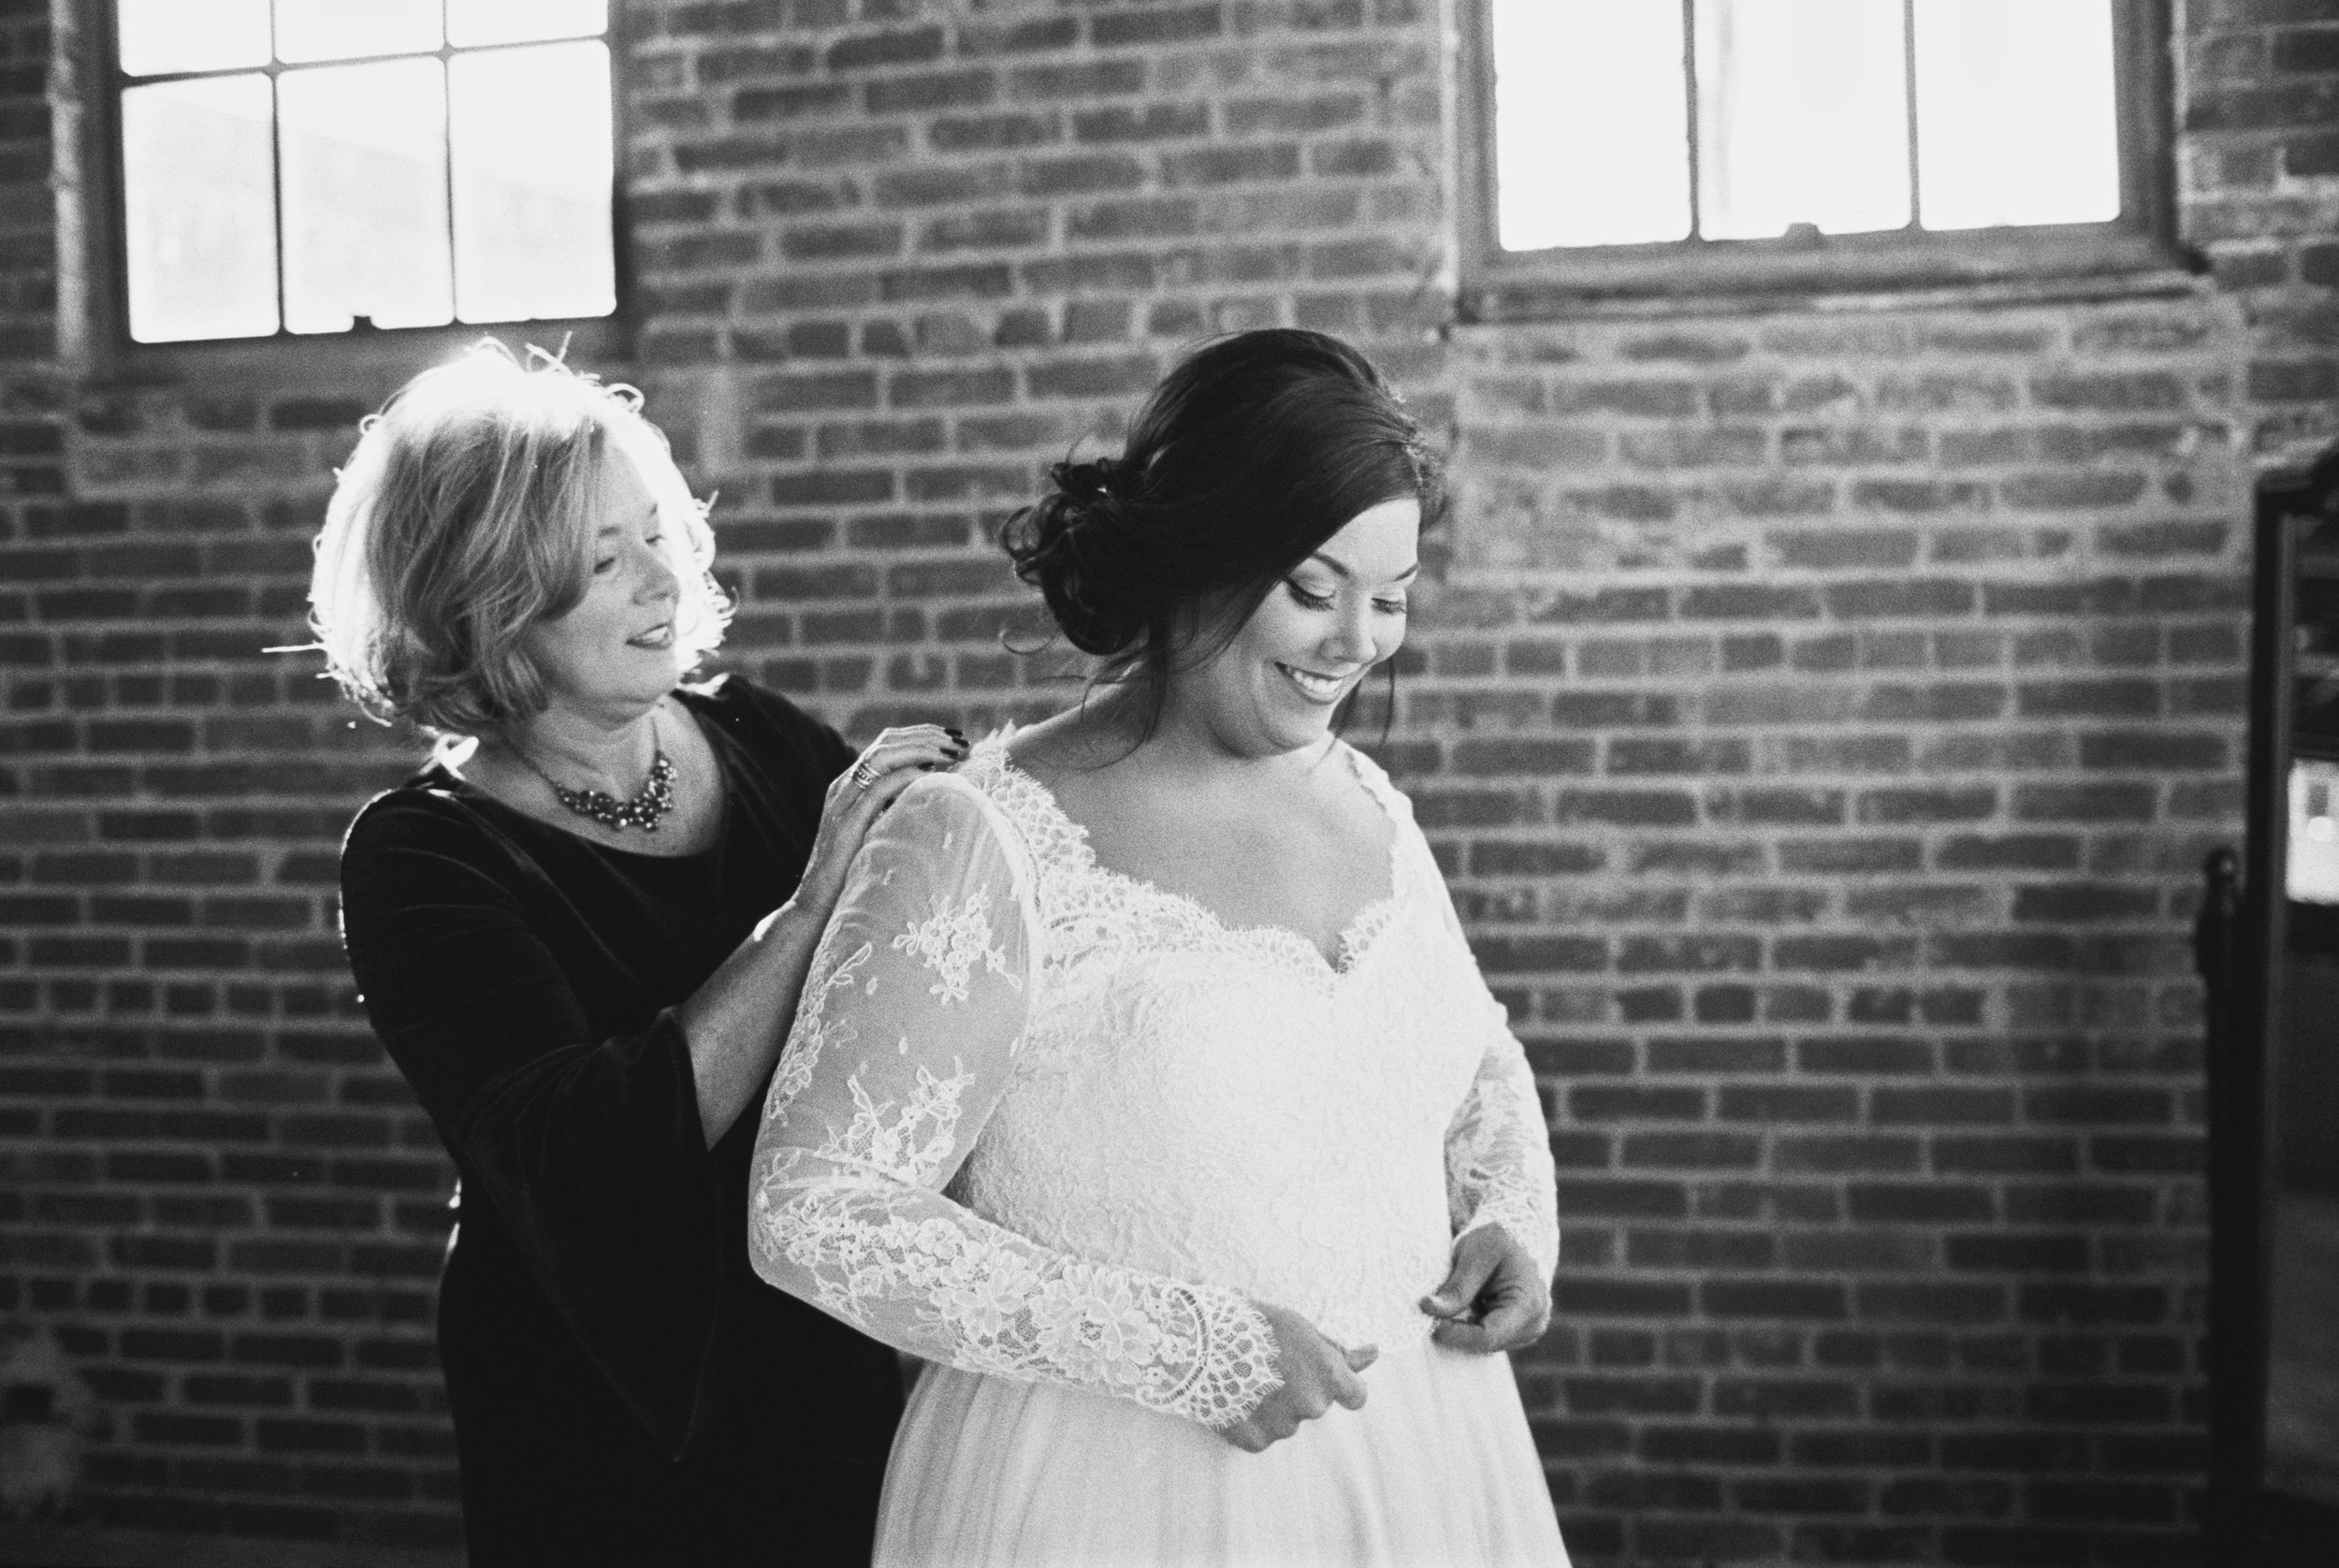 Lauren_Jeremy_Standard_Wedding_Knoxville_Abigail_Malone_Photography_FIlm-101.jpg